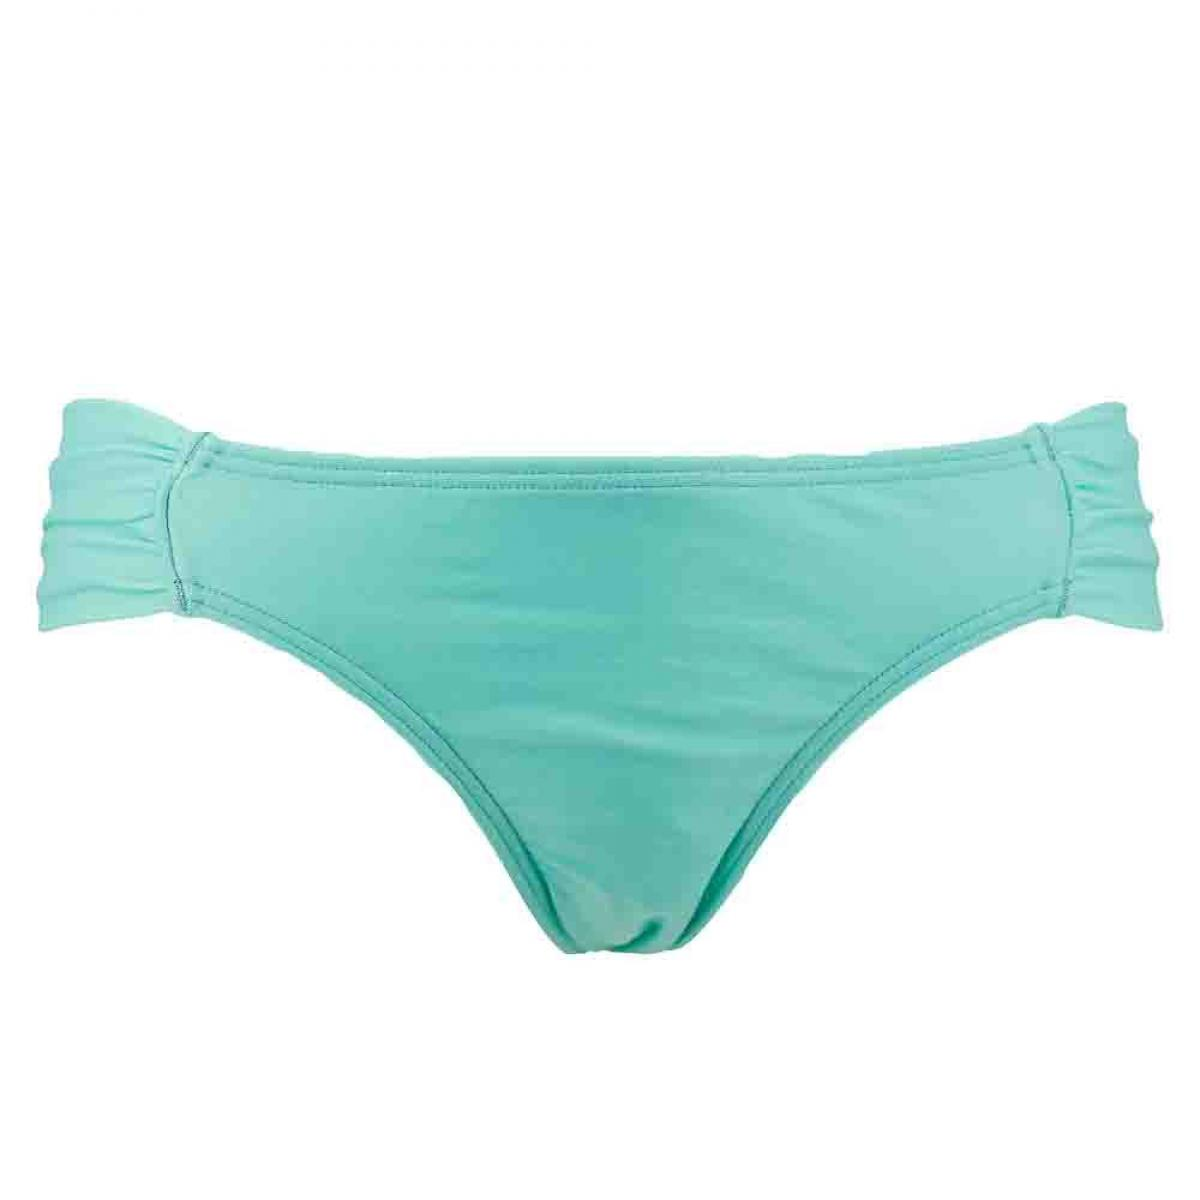 Culotte de bain love n surf cockatoo par rip curl for Bain s curve